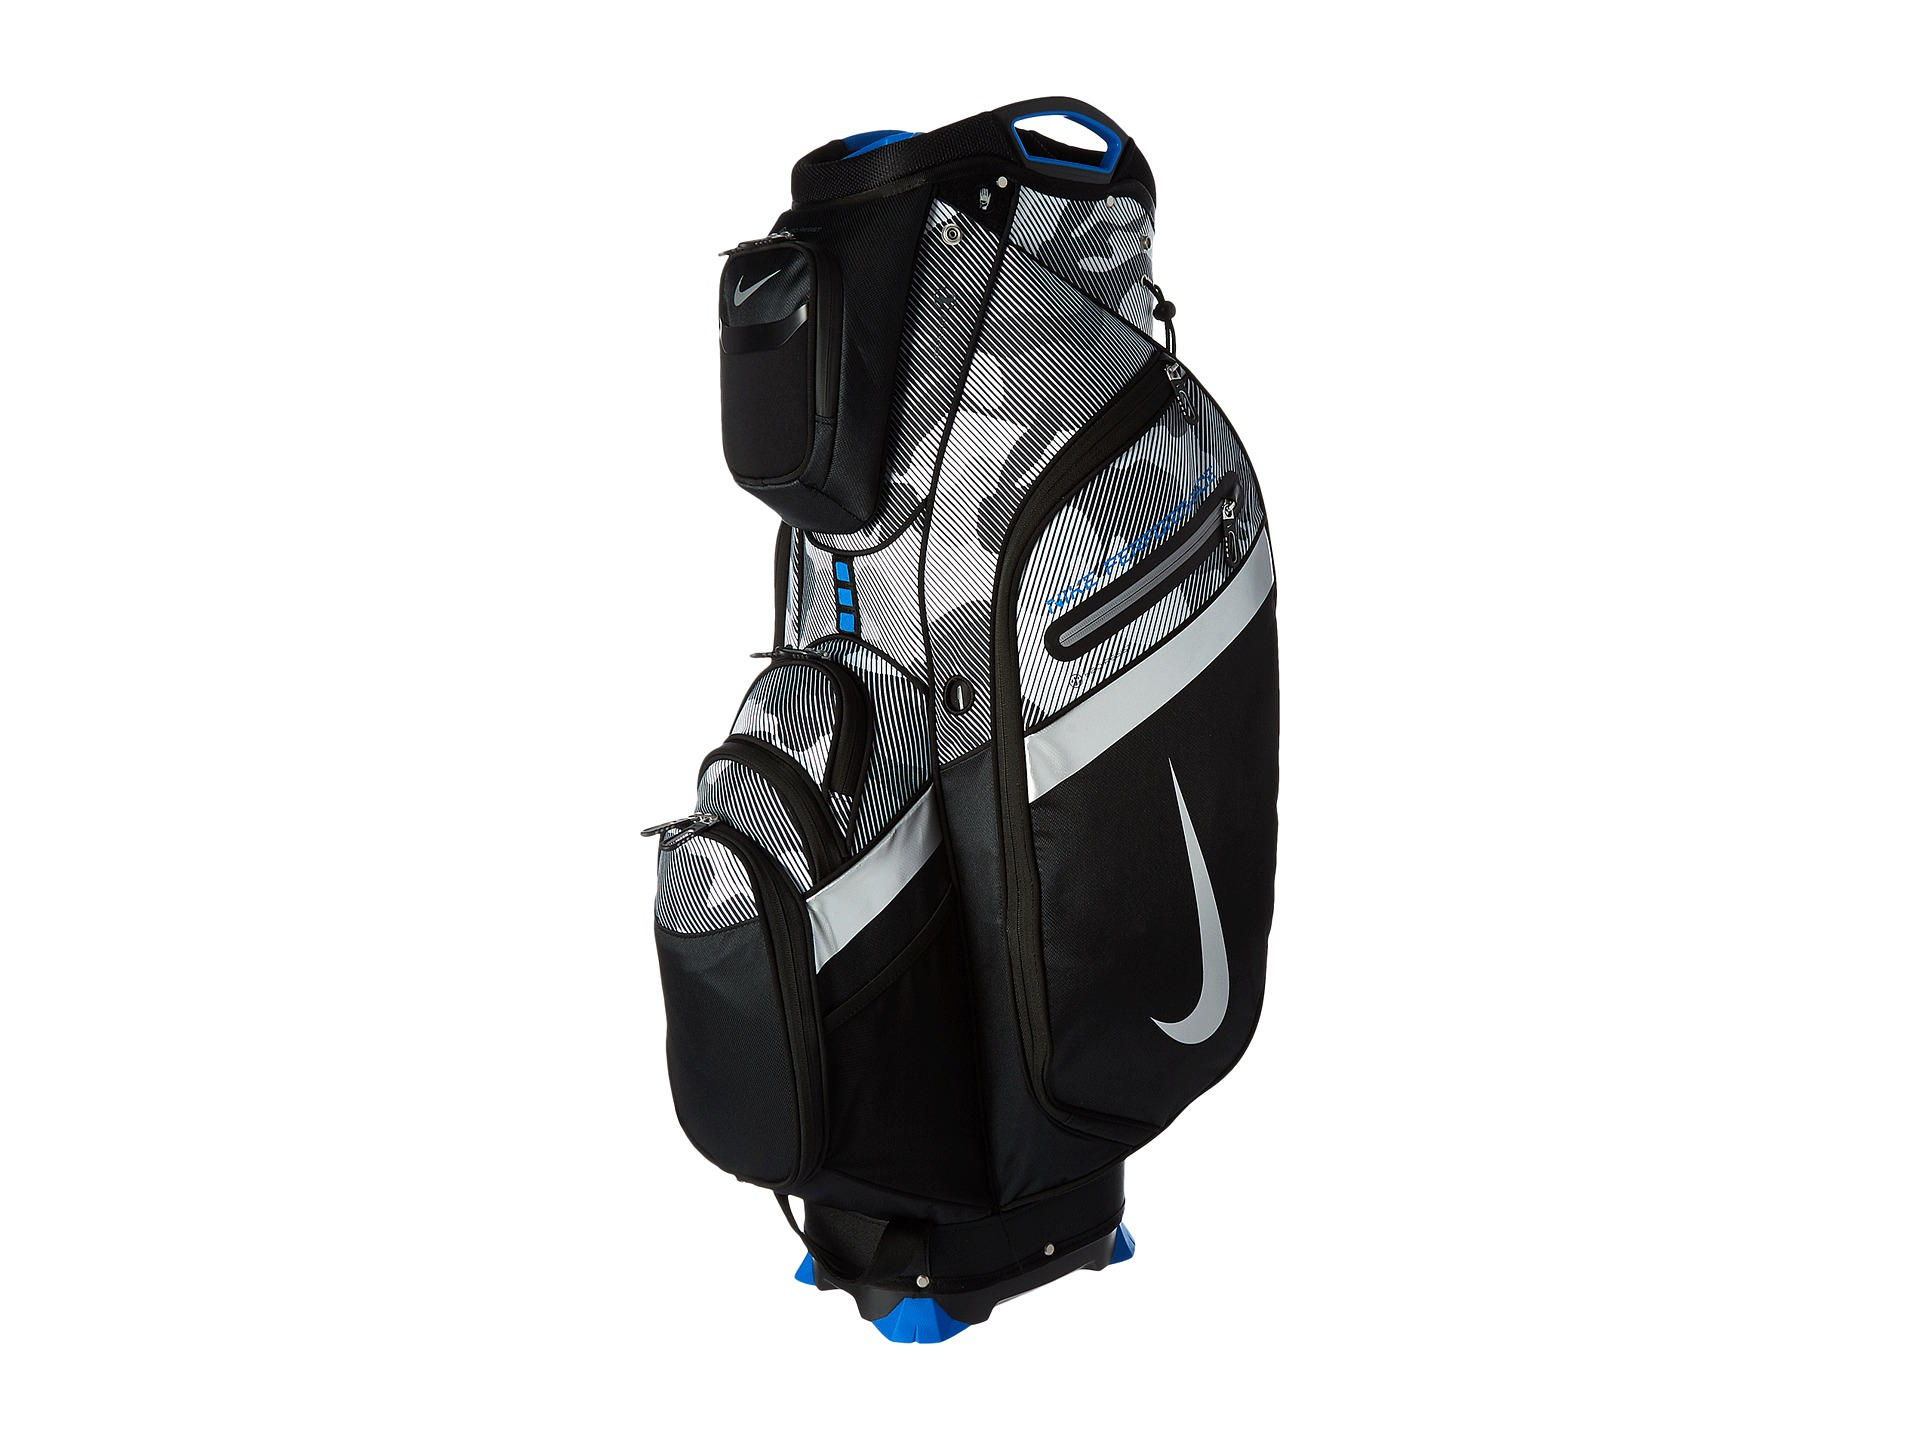 Lyst - Nike Performance Cart Iv in Black for Men 70d2009f3f1d6